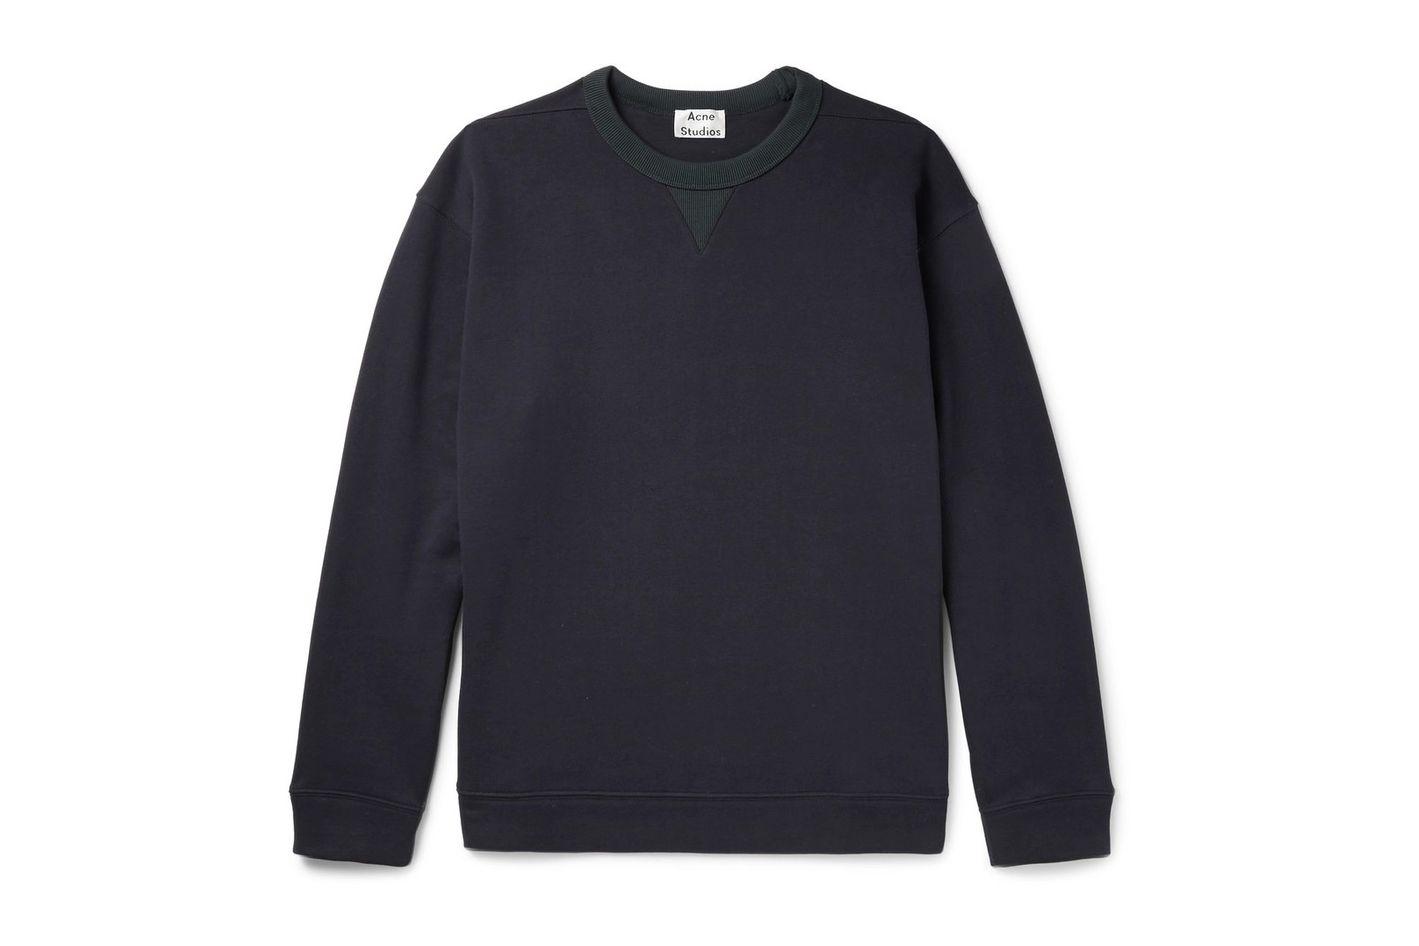 Acne Studios Field Sweatshirt